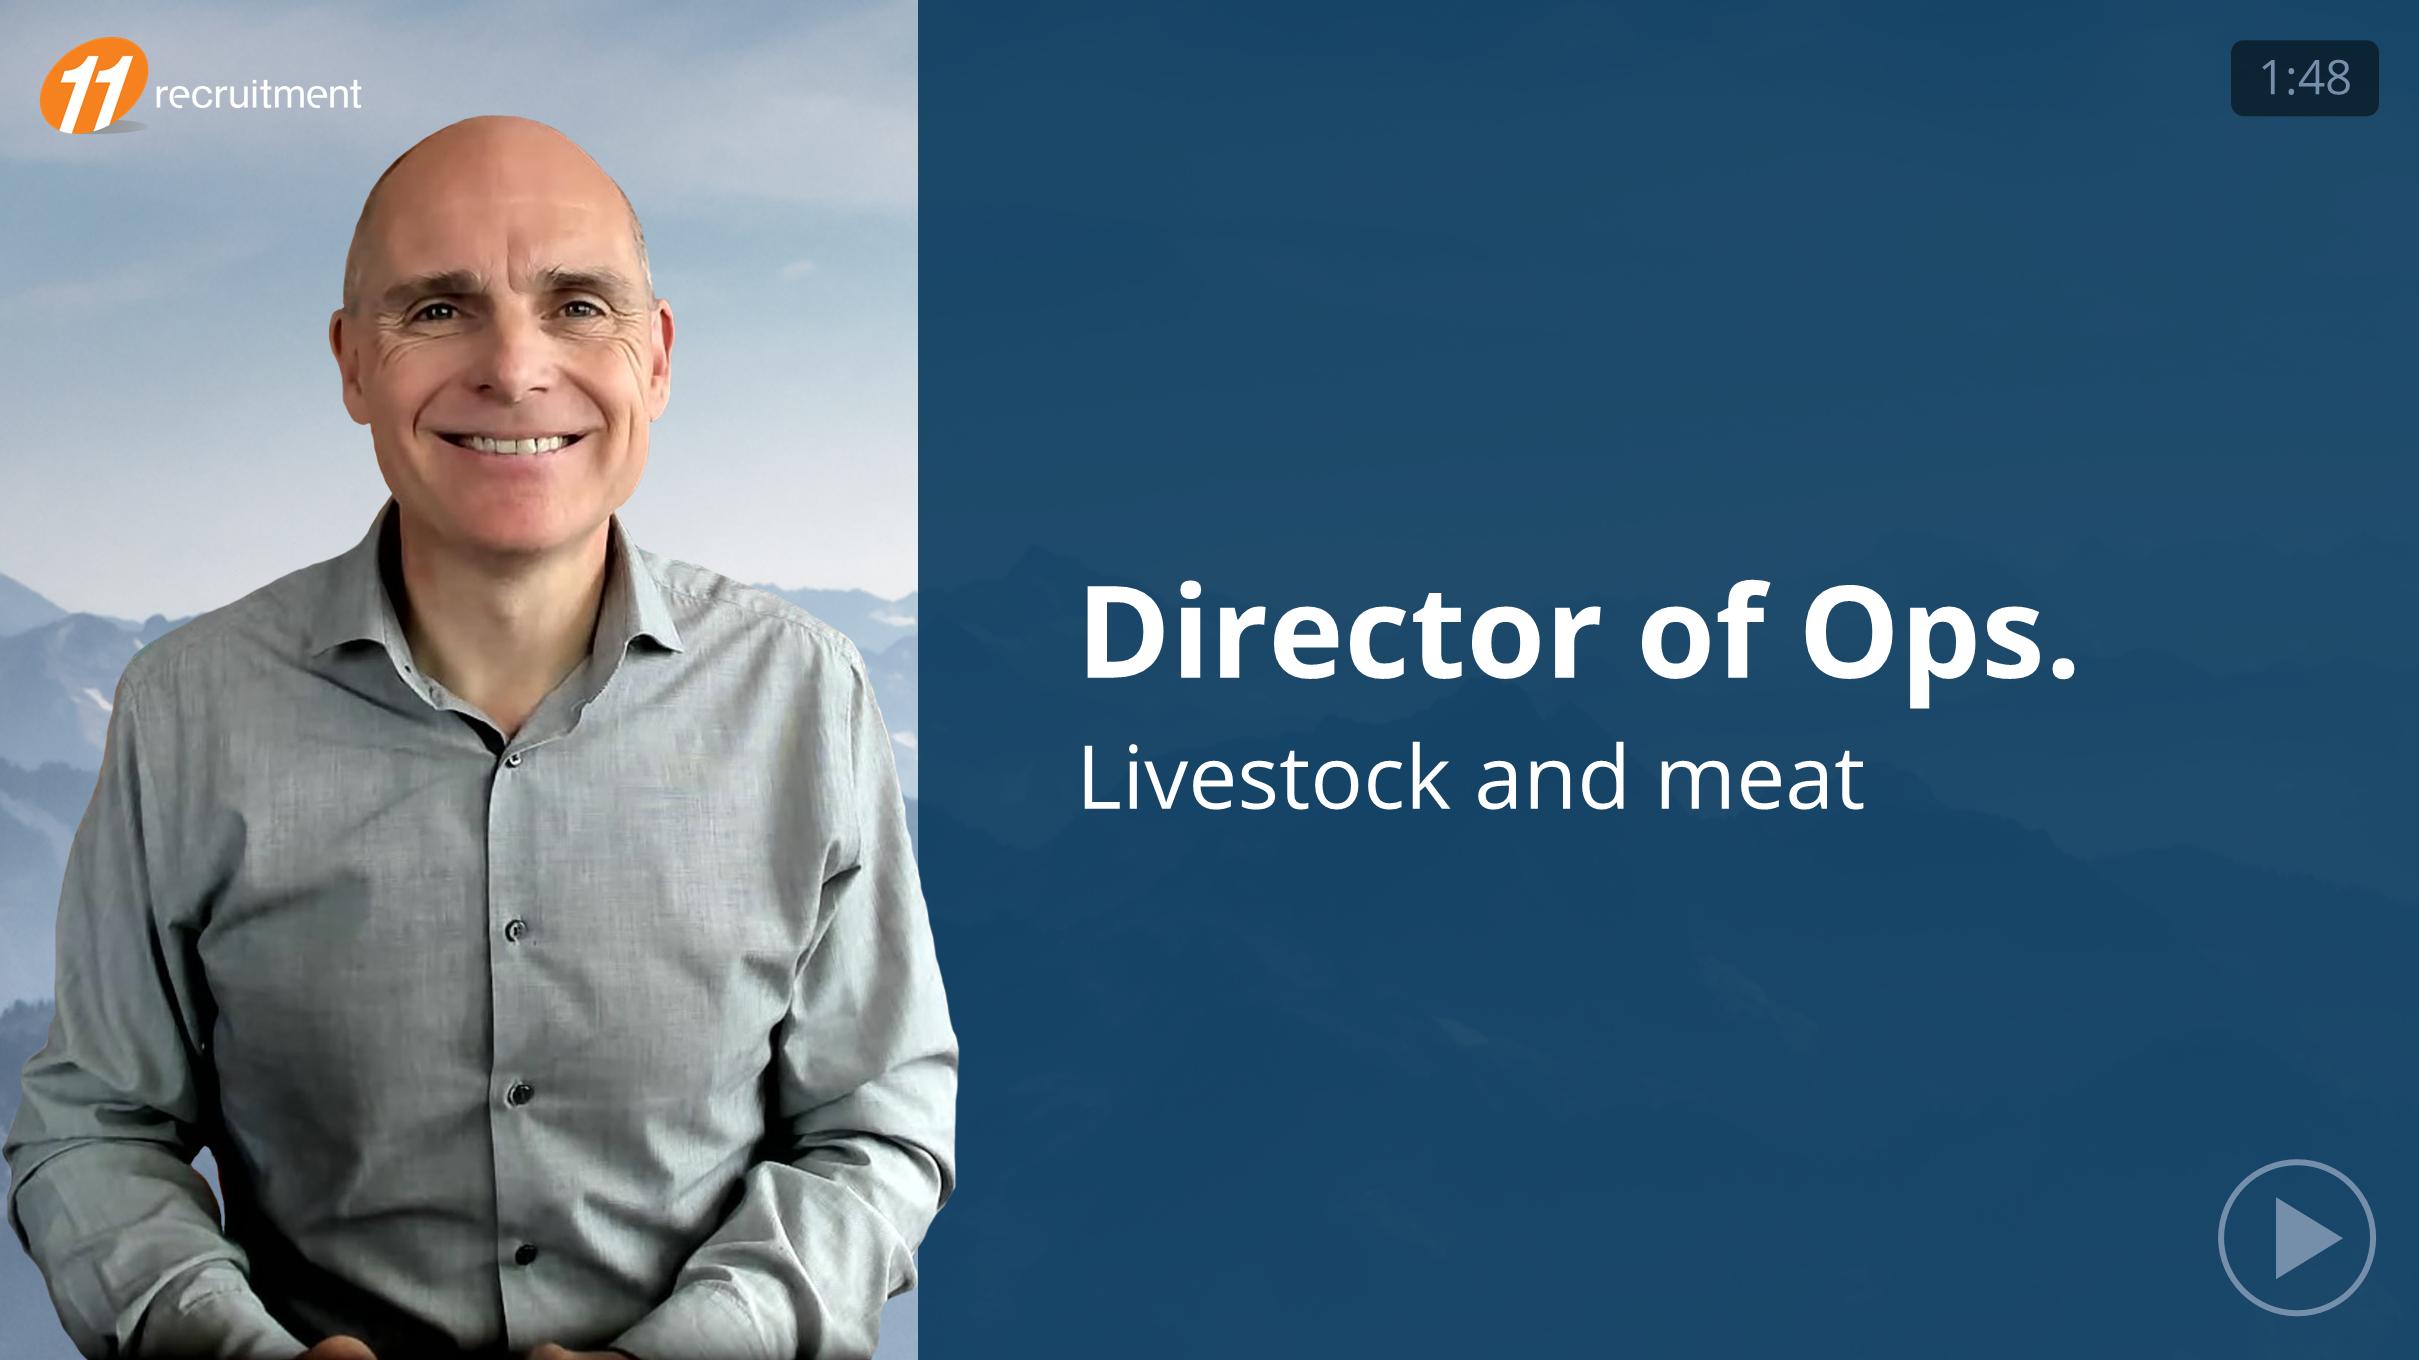 Director of Operations - Livestock